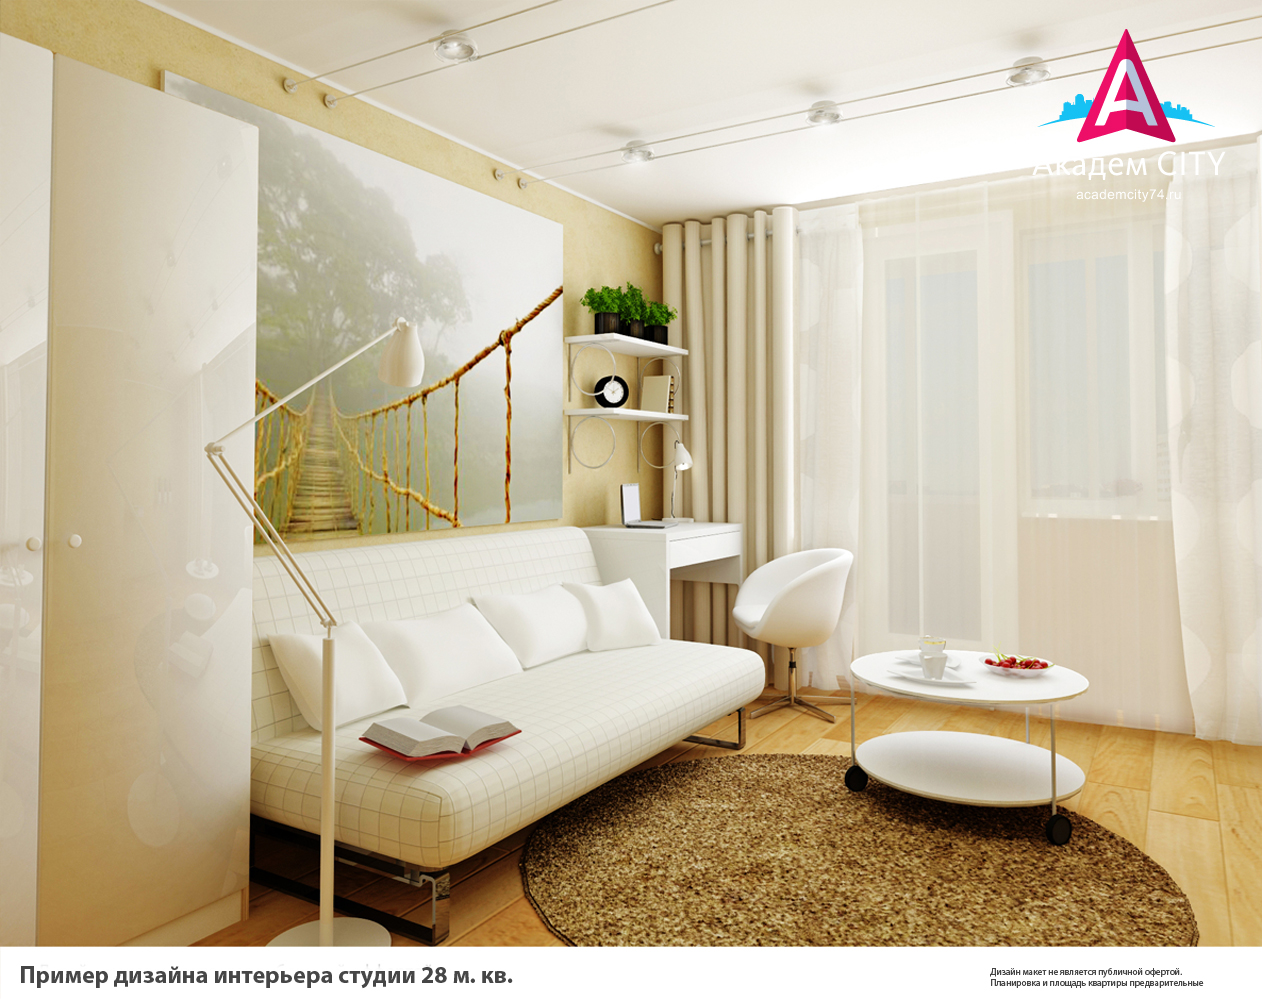 Дизайн квартиры работ